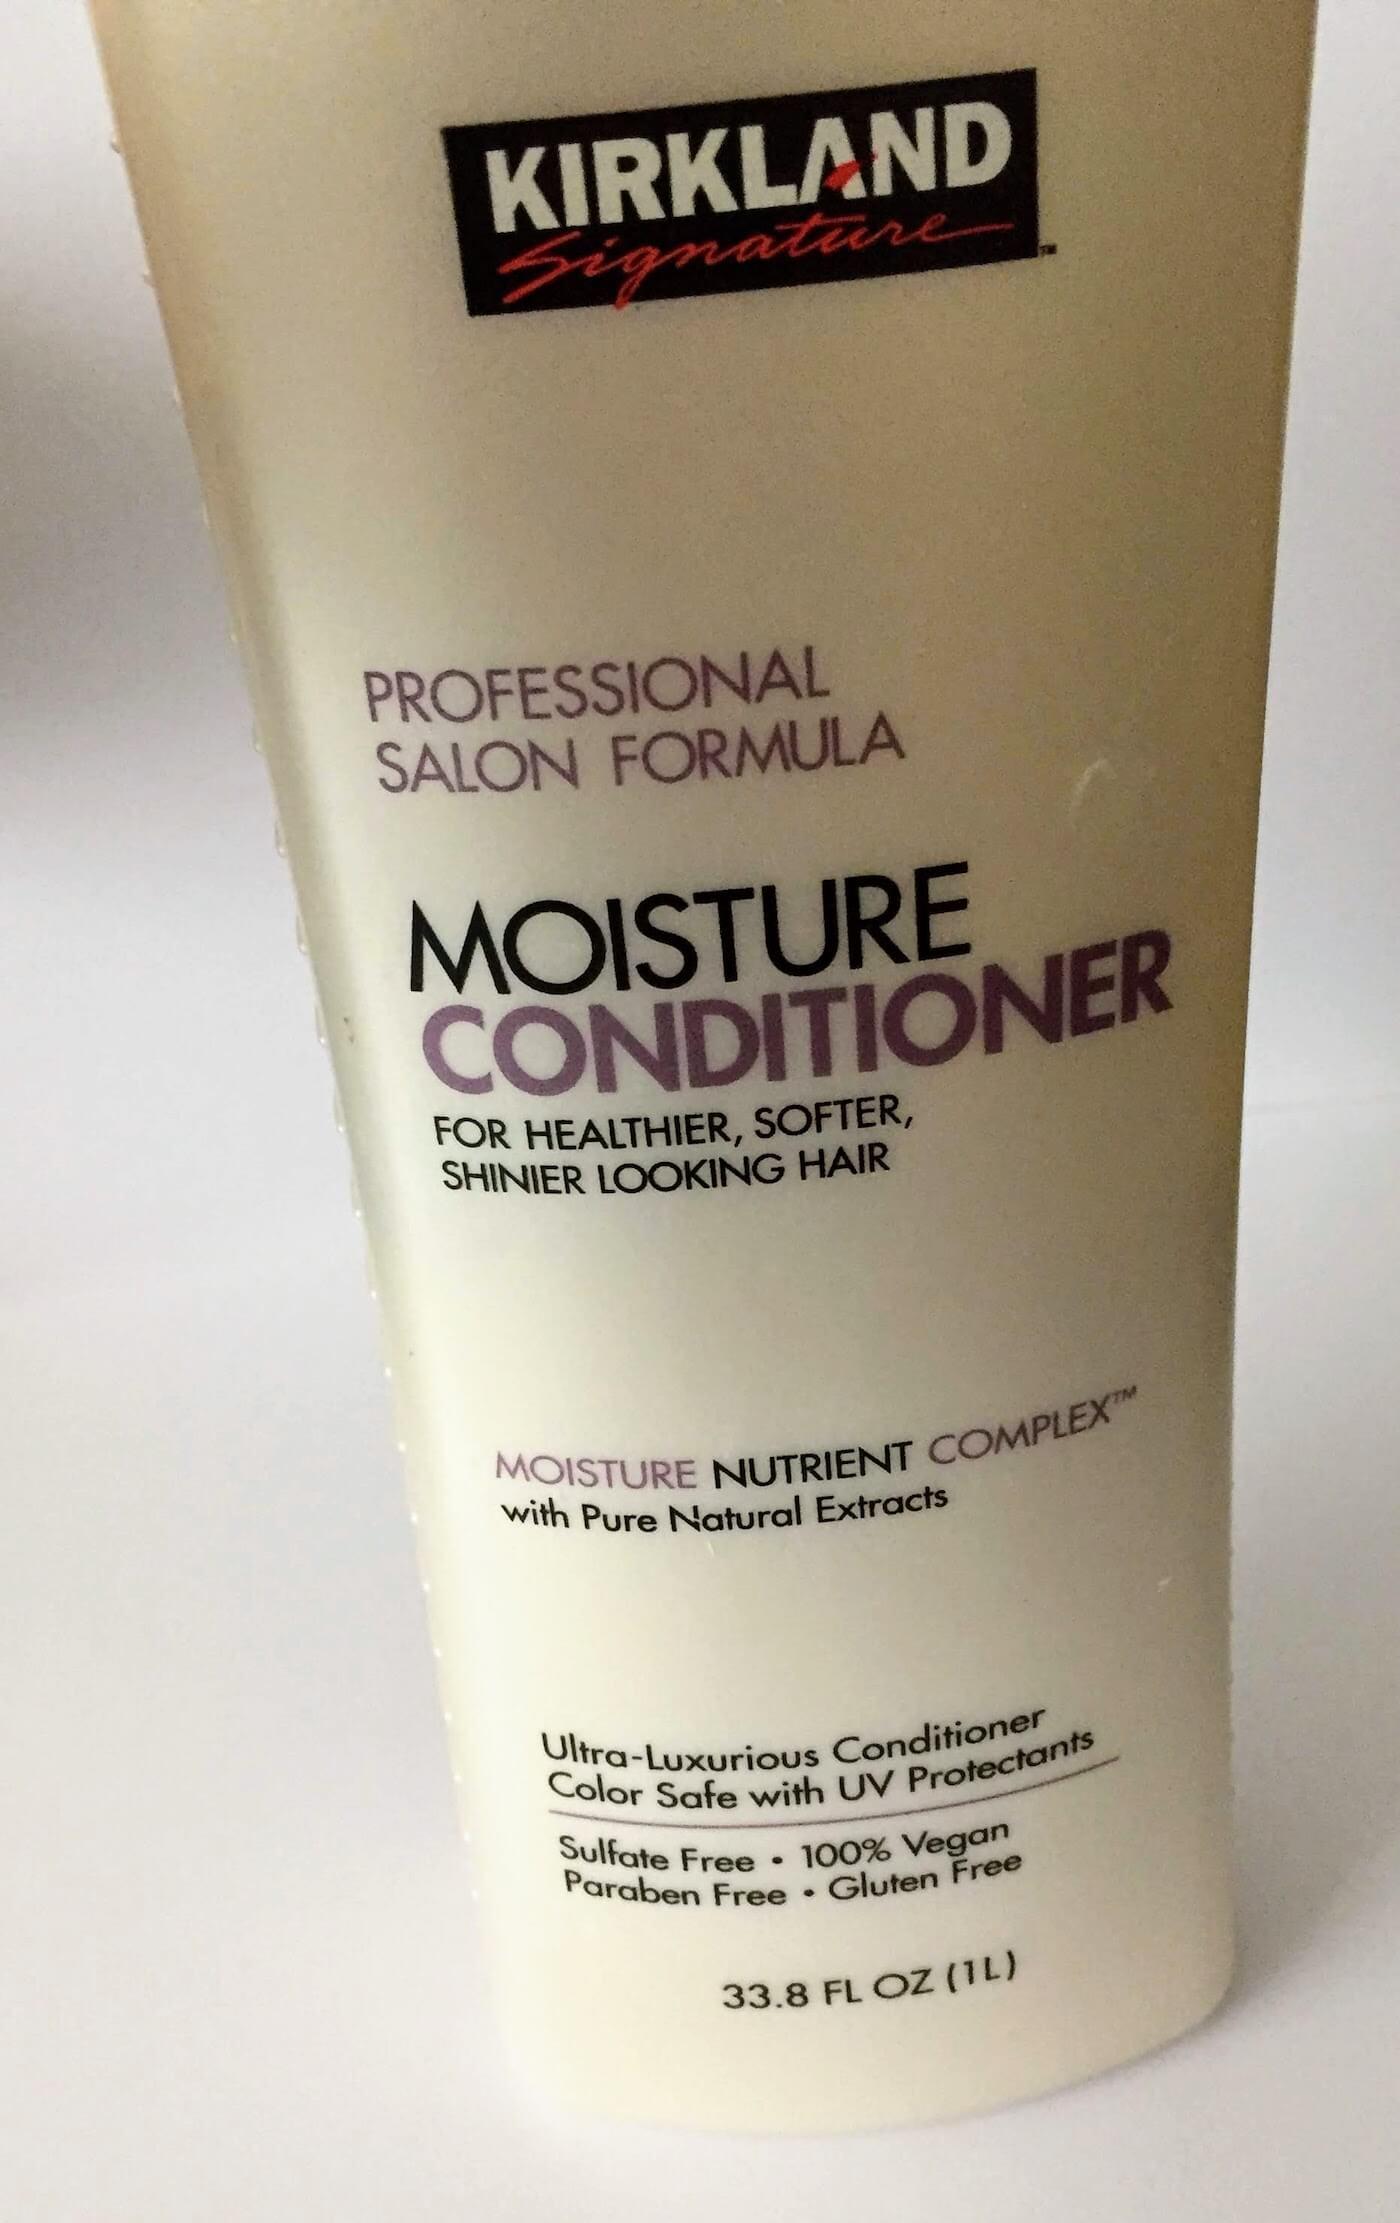 Kirkland Signature Moisture Conditioner Review